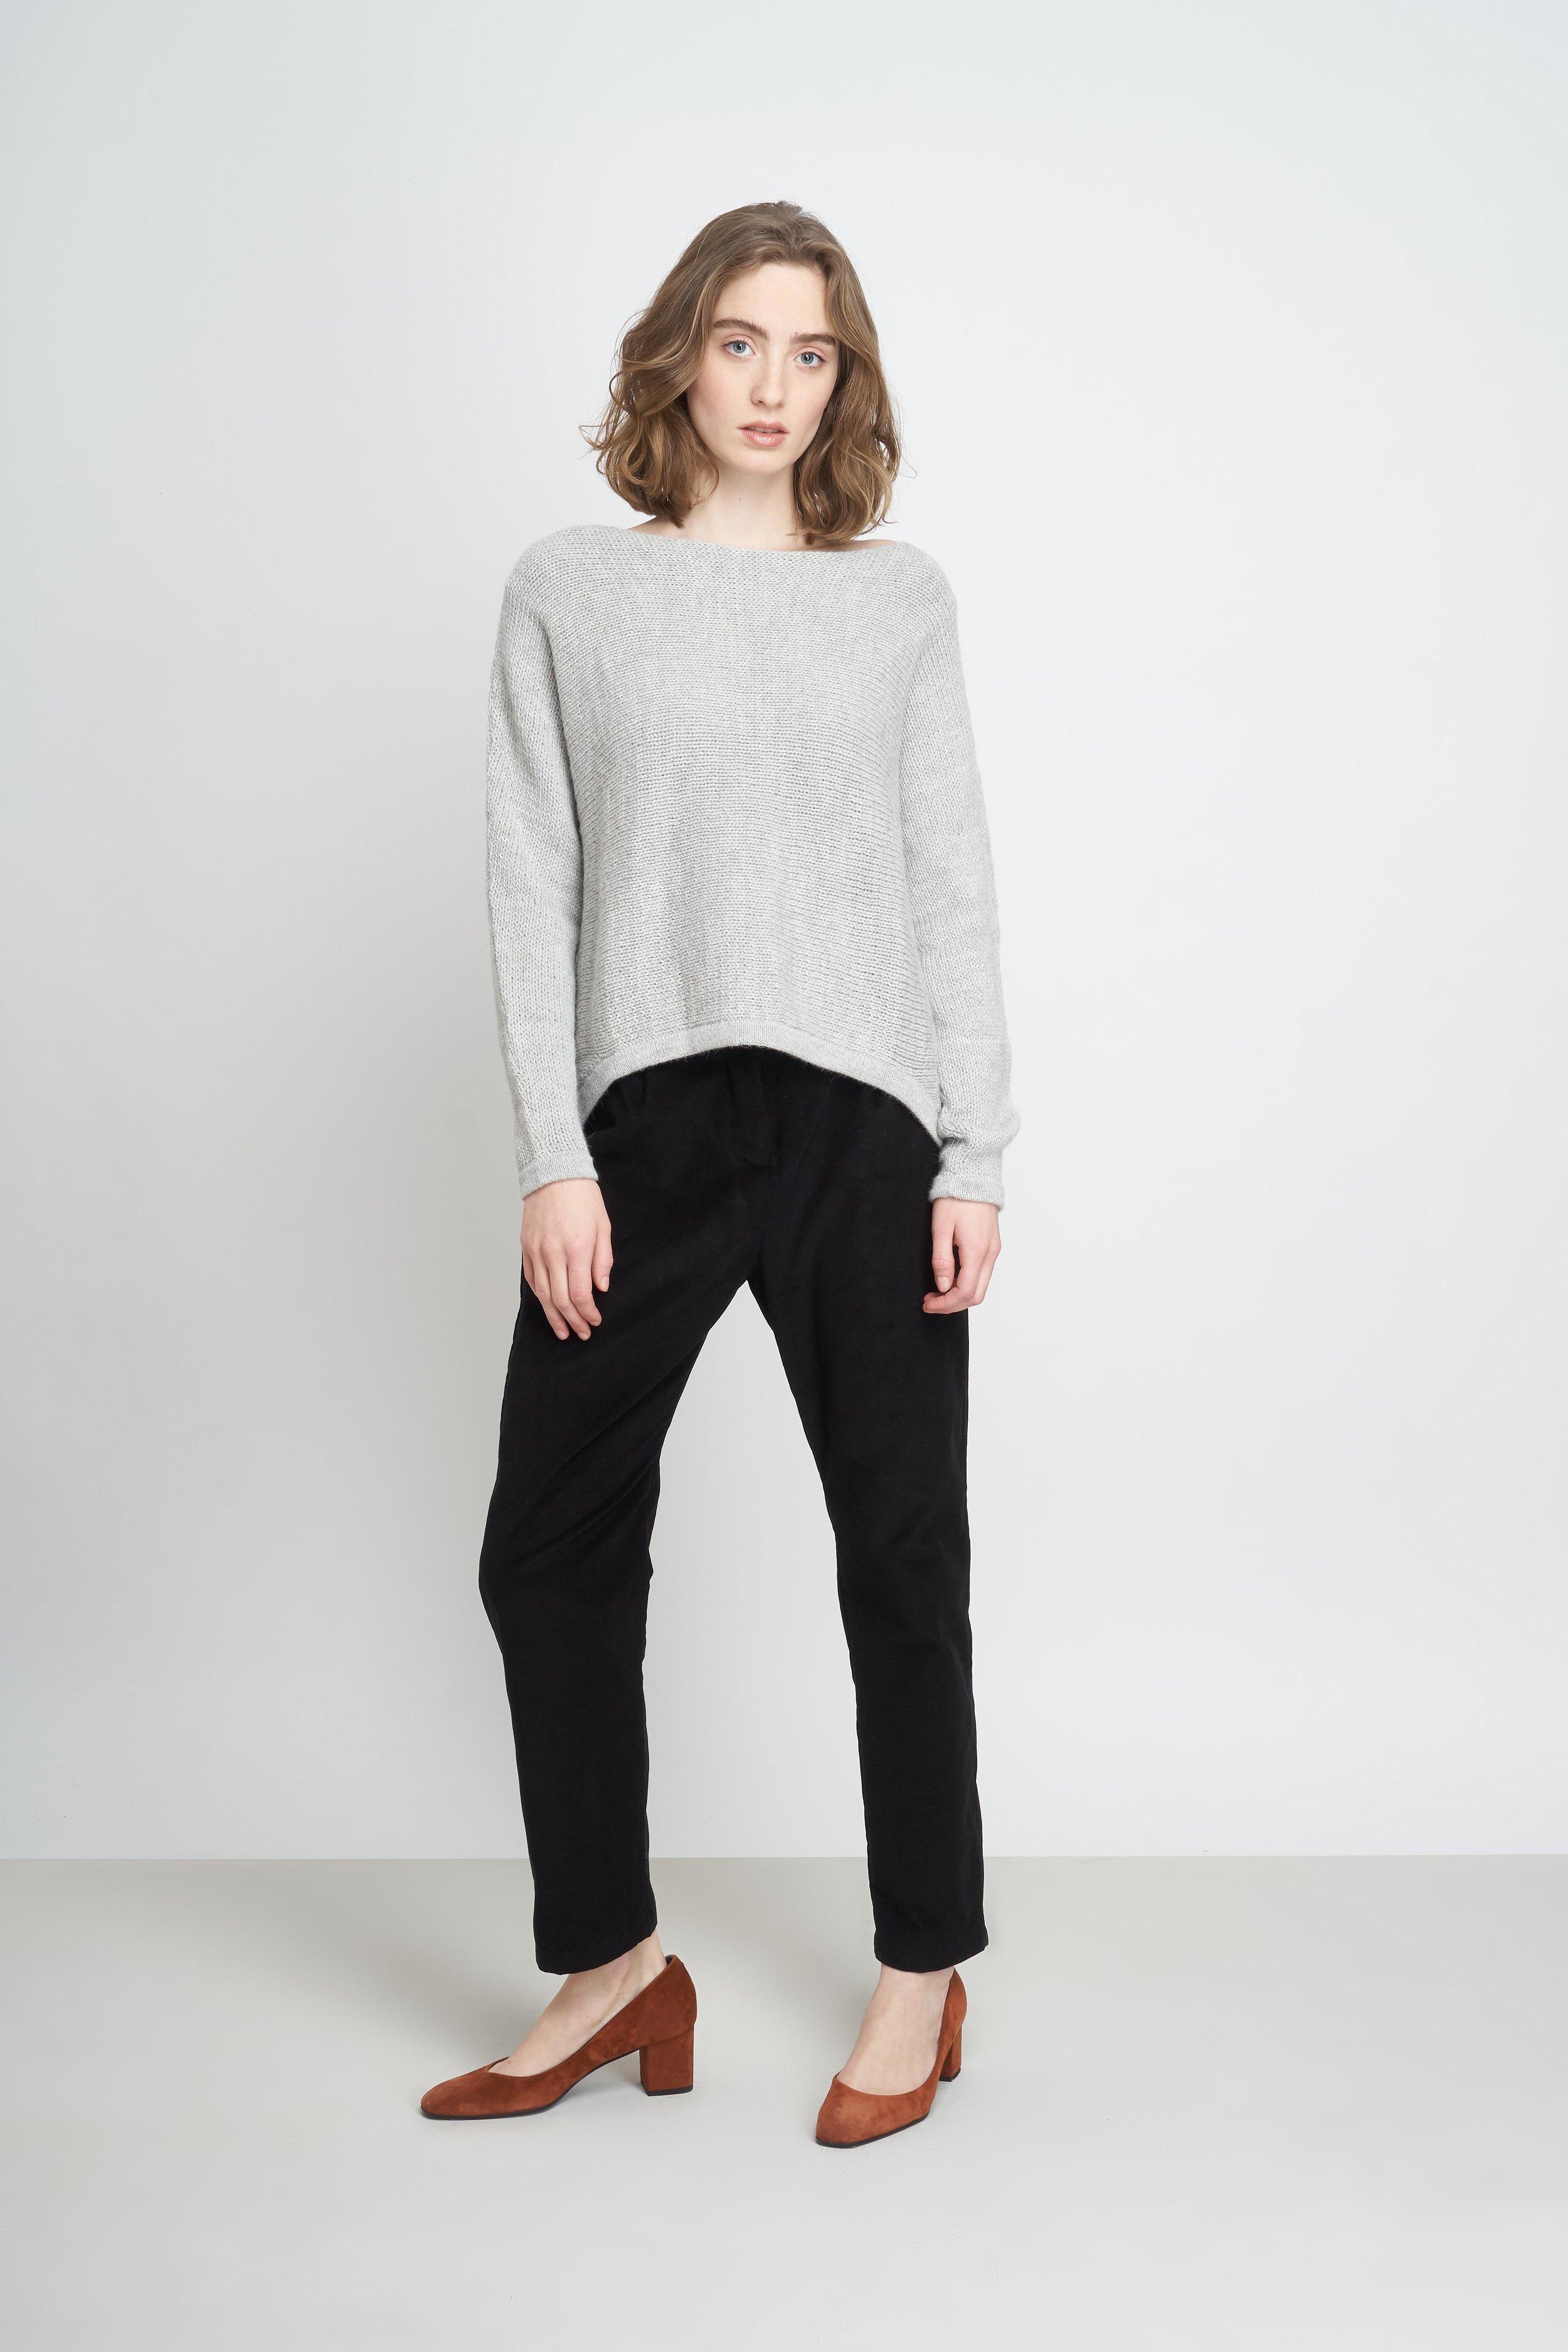 Nieve Sweater